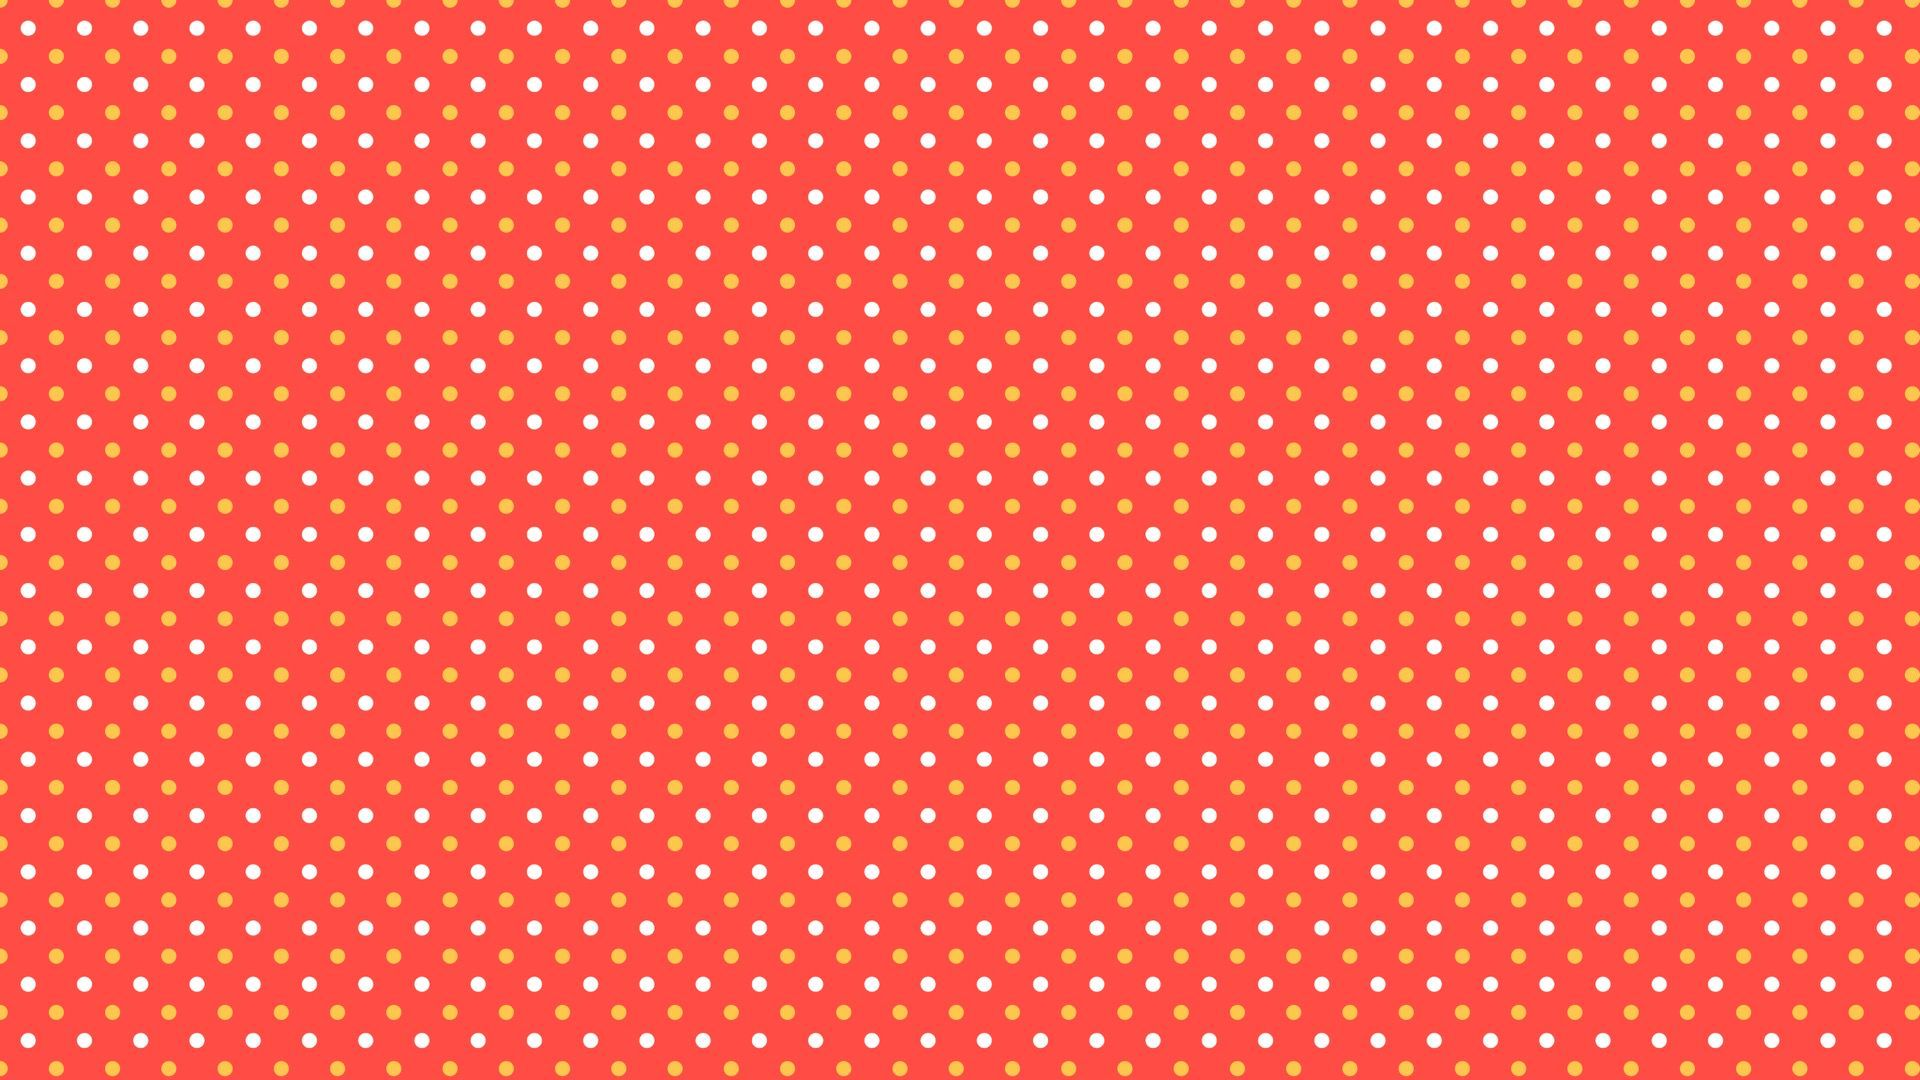 Dots Nice Wallpaper